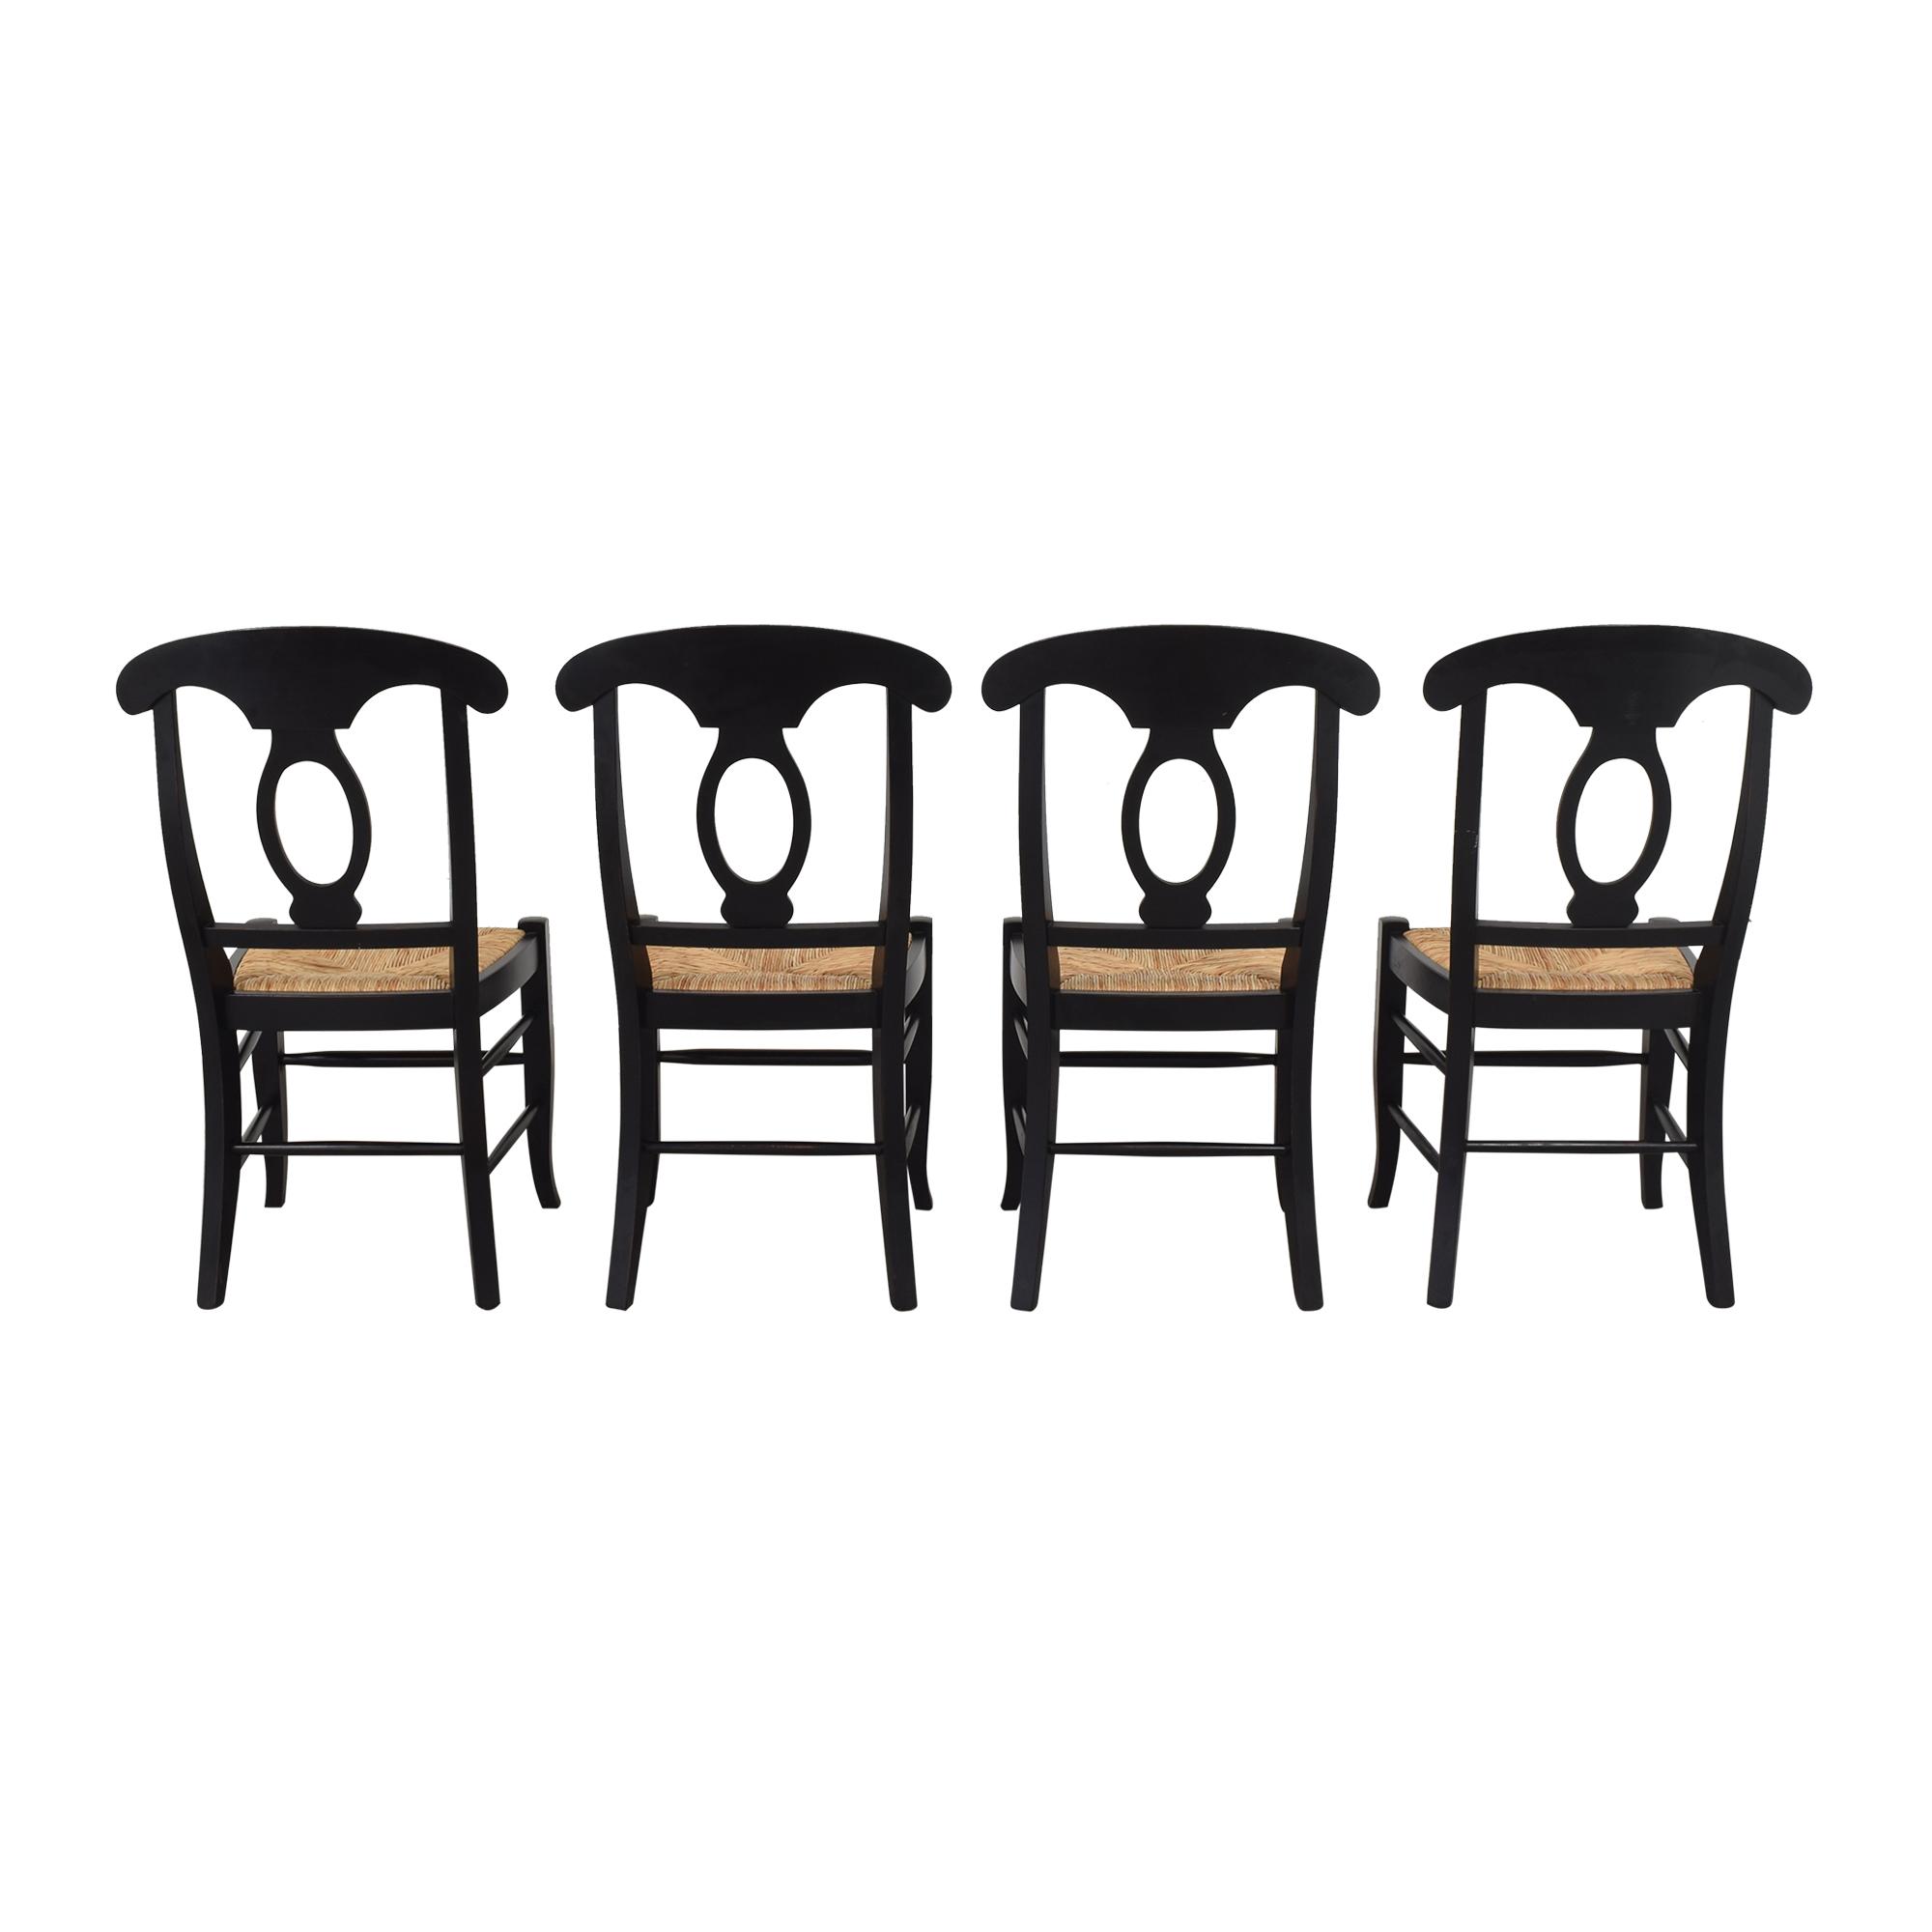 Pottery Barn Pottery Barn Napoleon Dining Side Chairs ma